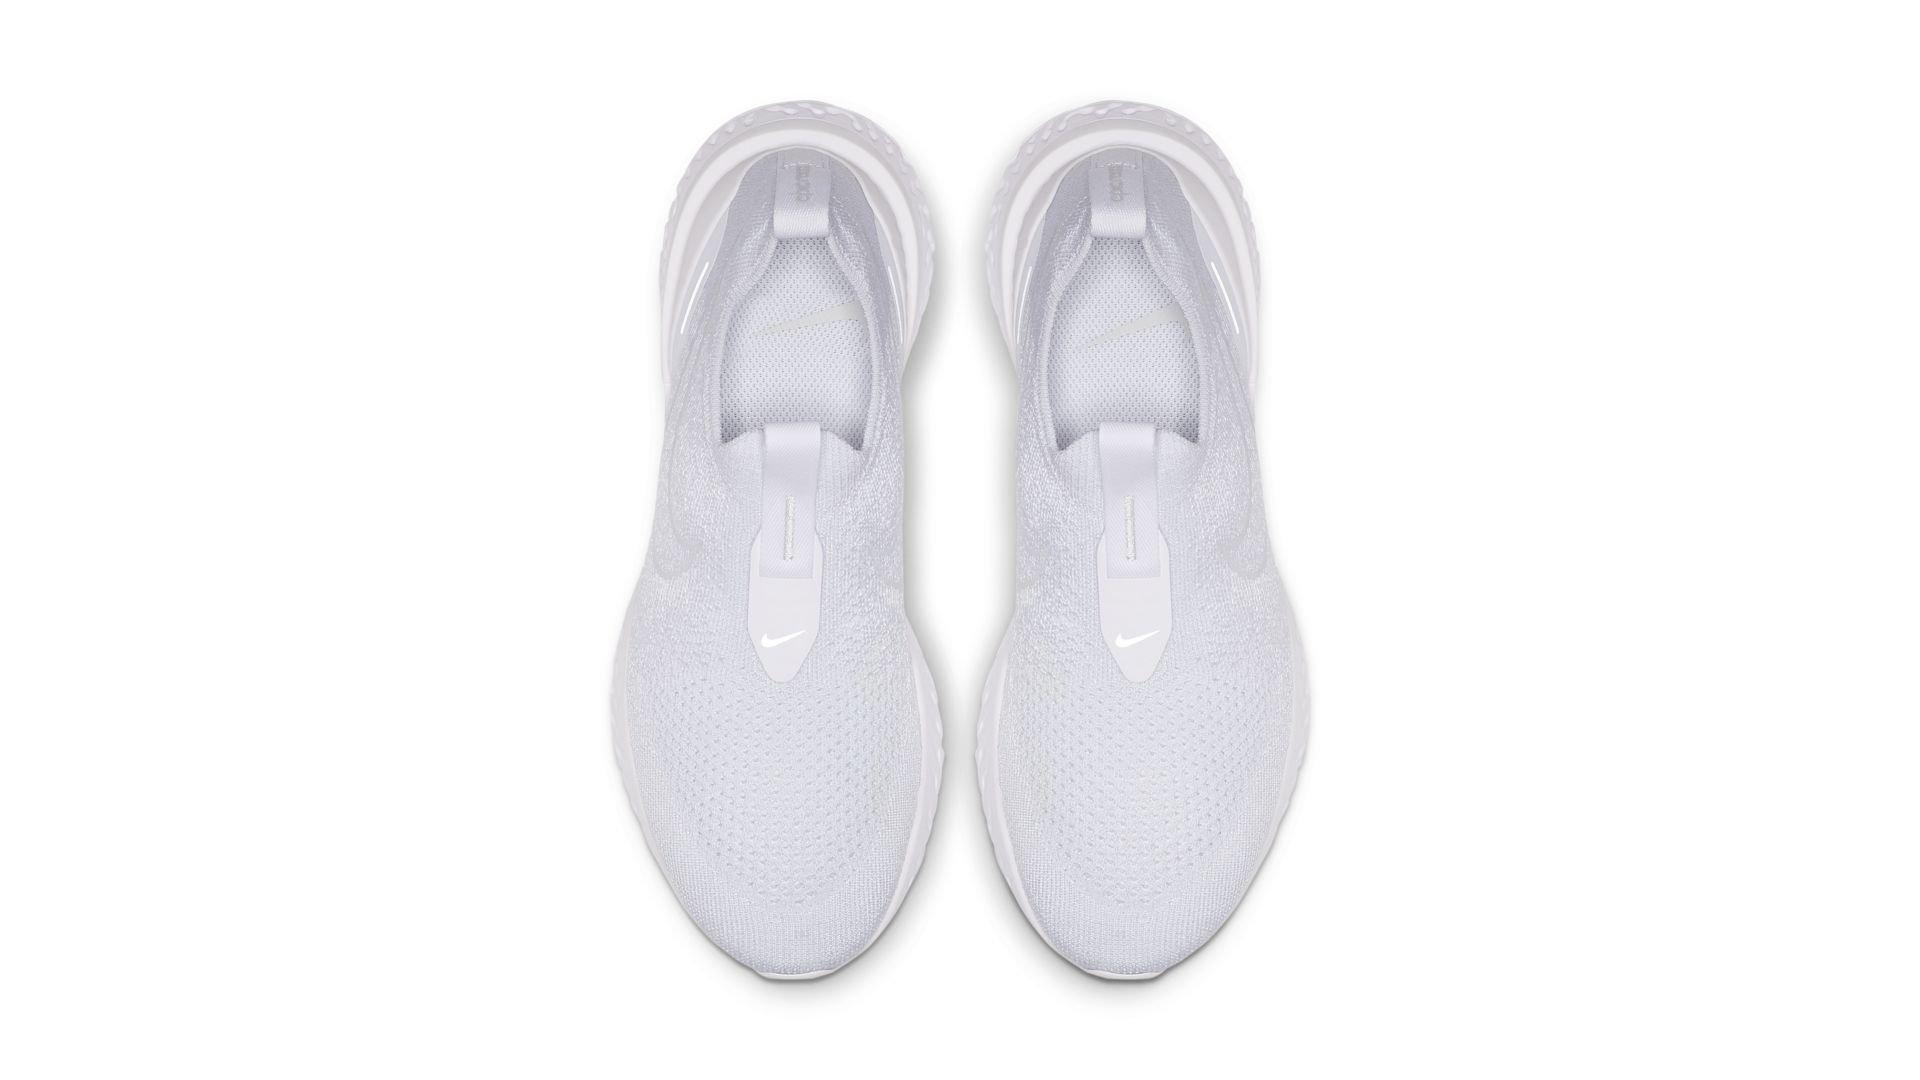 Nike Epic Phantom React Flyknit White Pure Platinum (W) (BV0415-100)